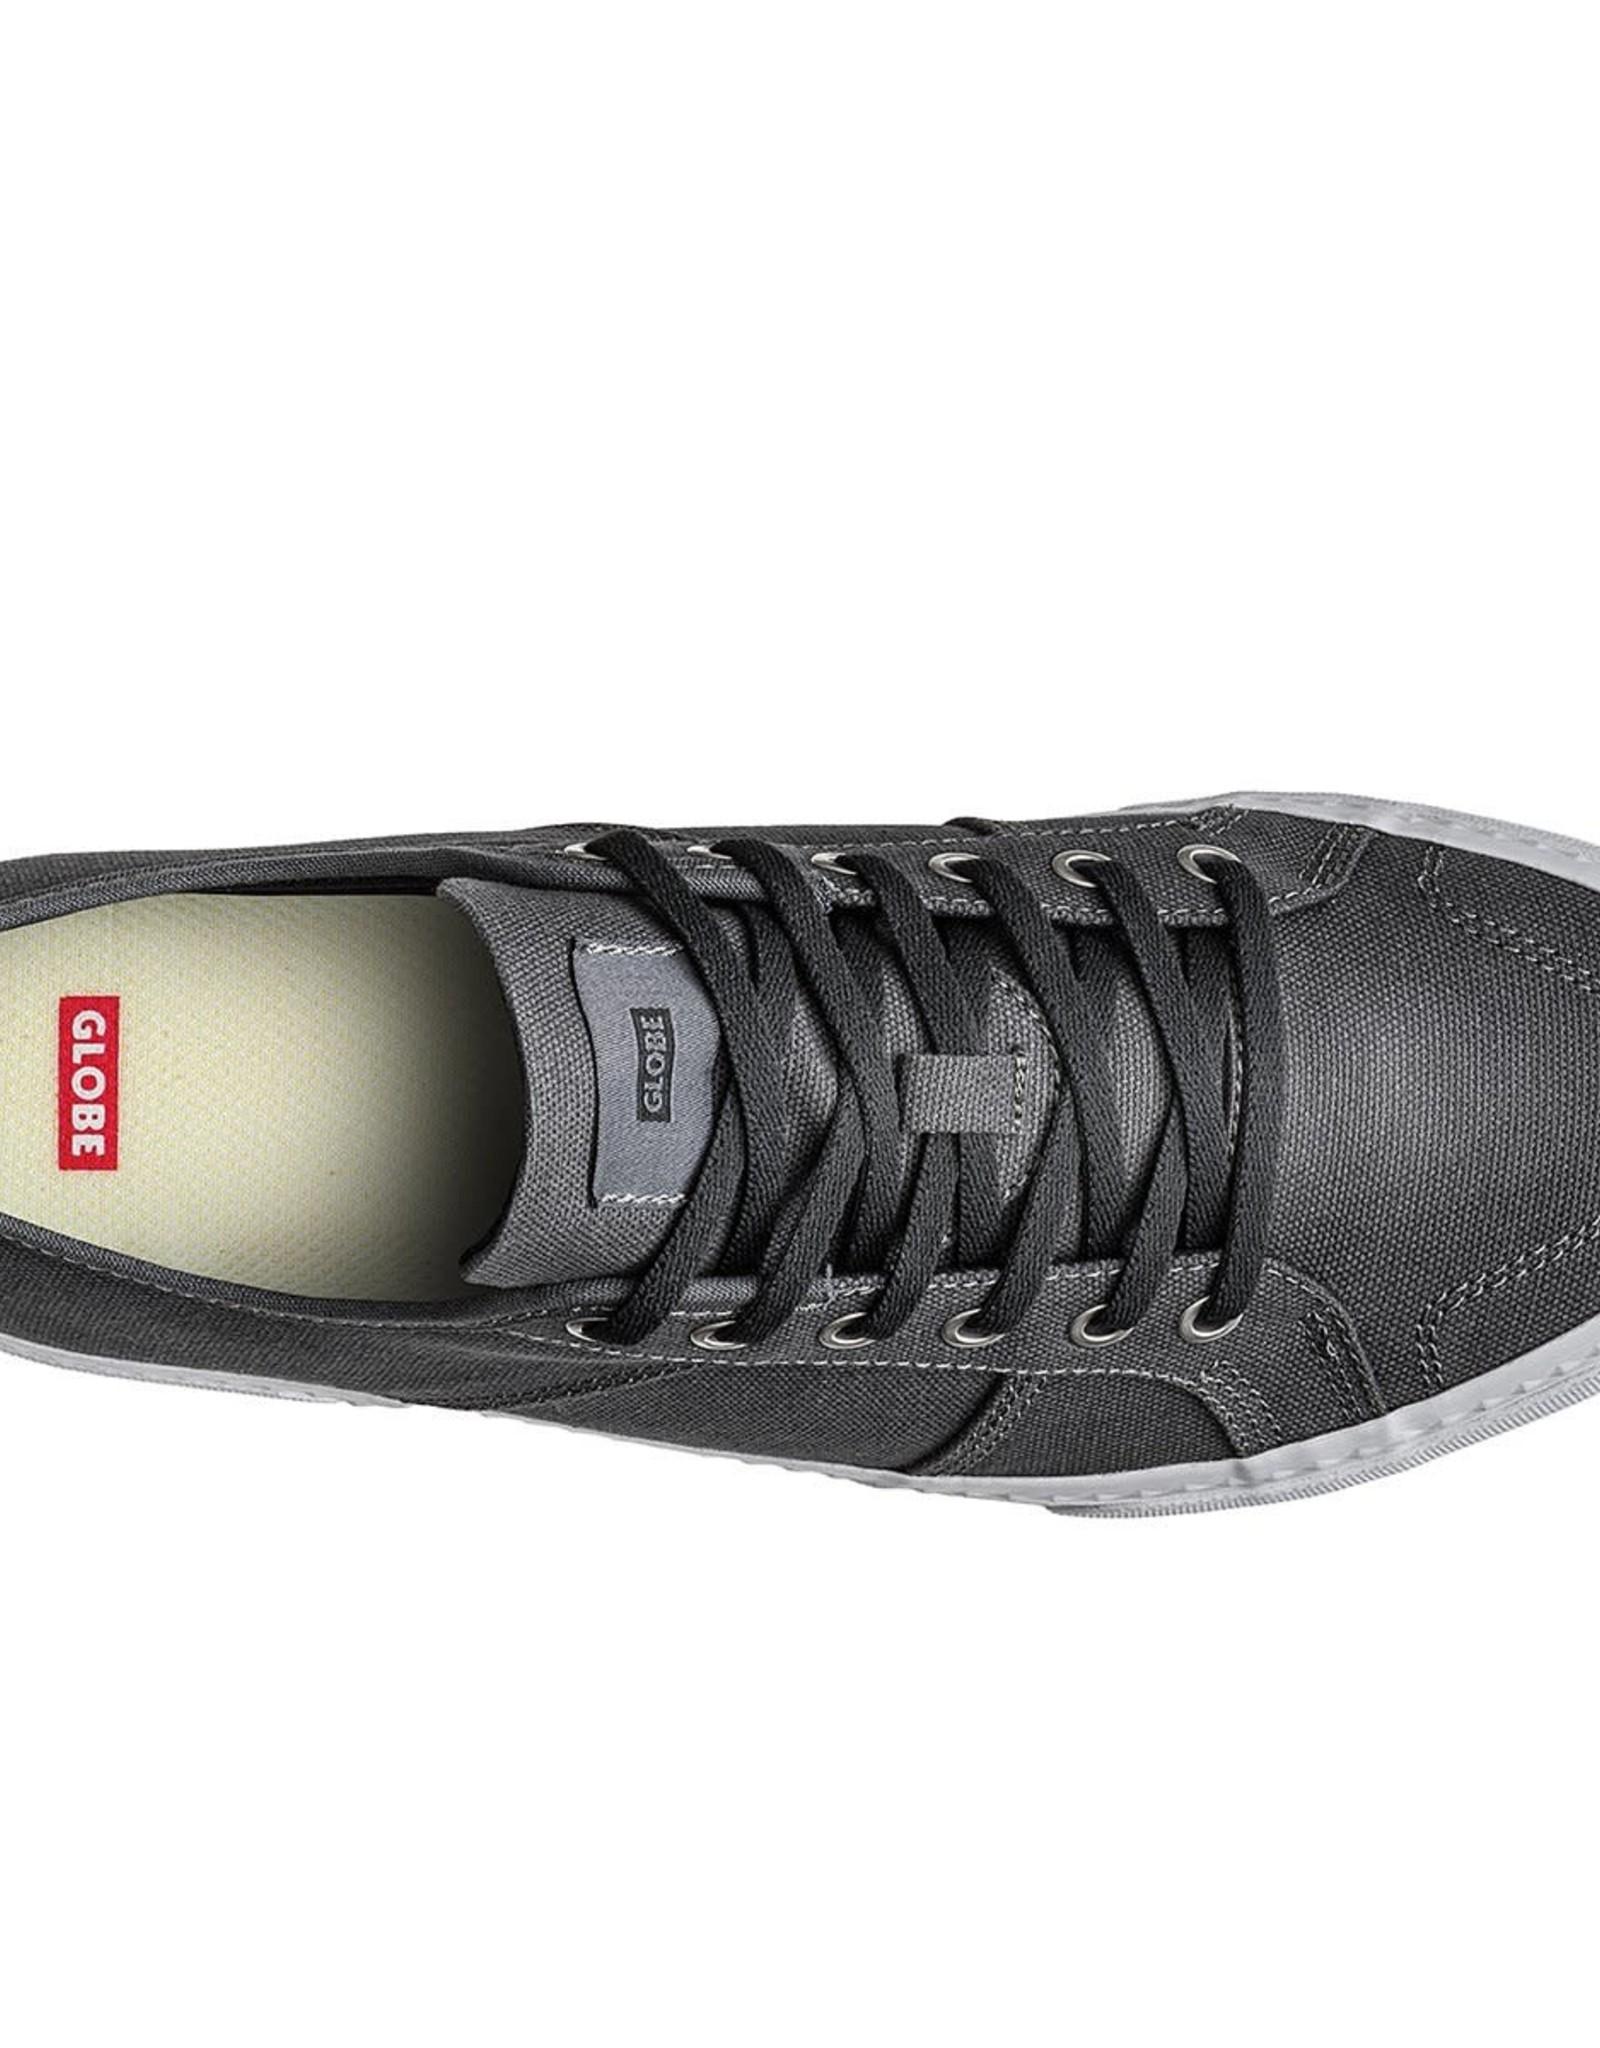 GLOBE Surplus Shoes